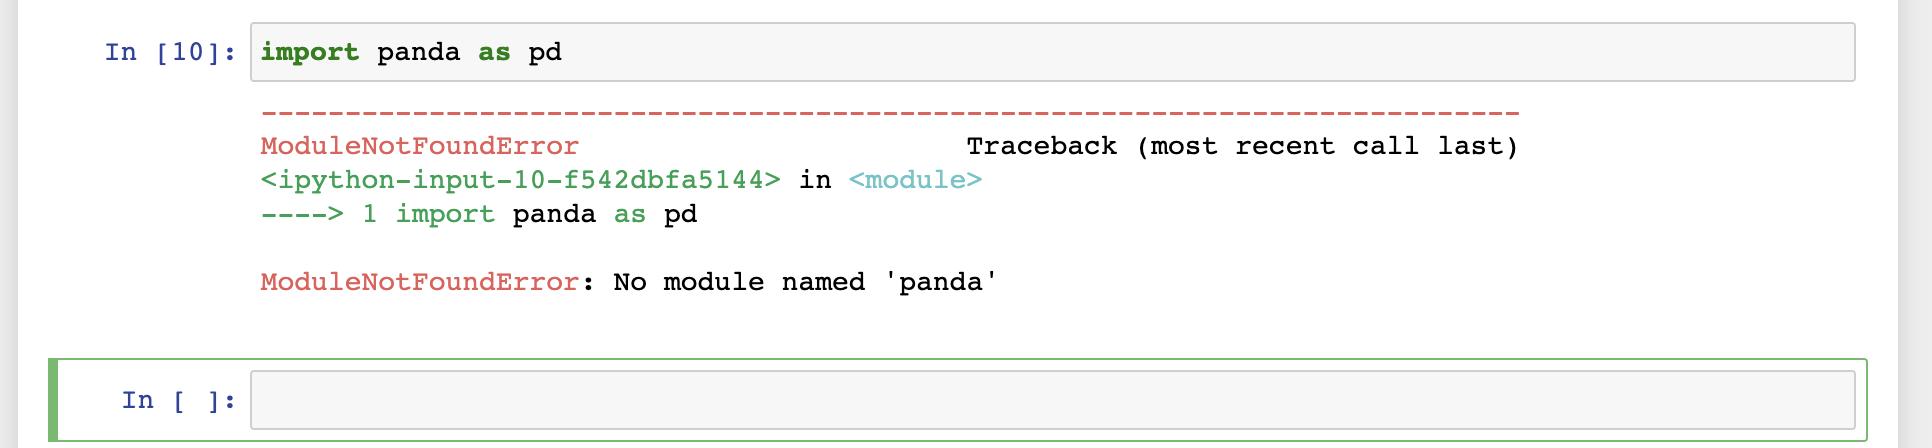 "module not found error showing ""ModuleNotFoundError: No module named 'panda'"" and ""----> 1 import panda as pd"""